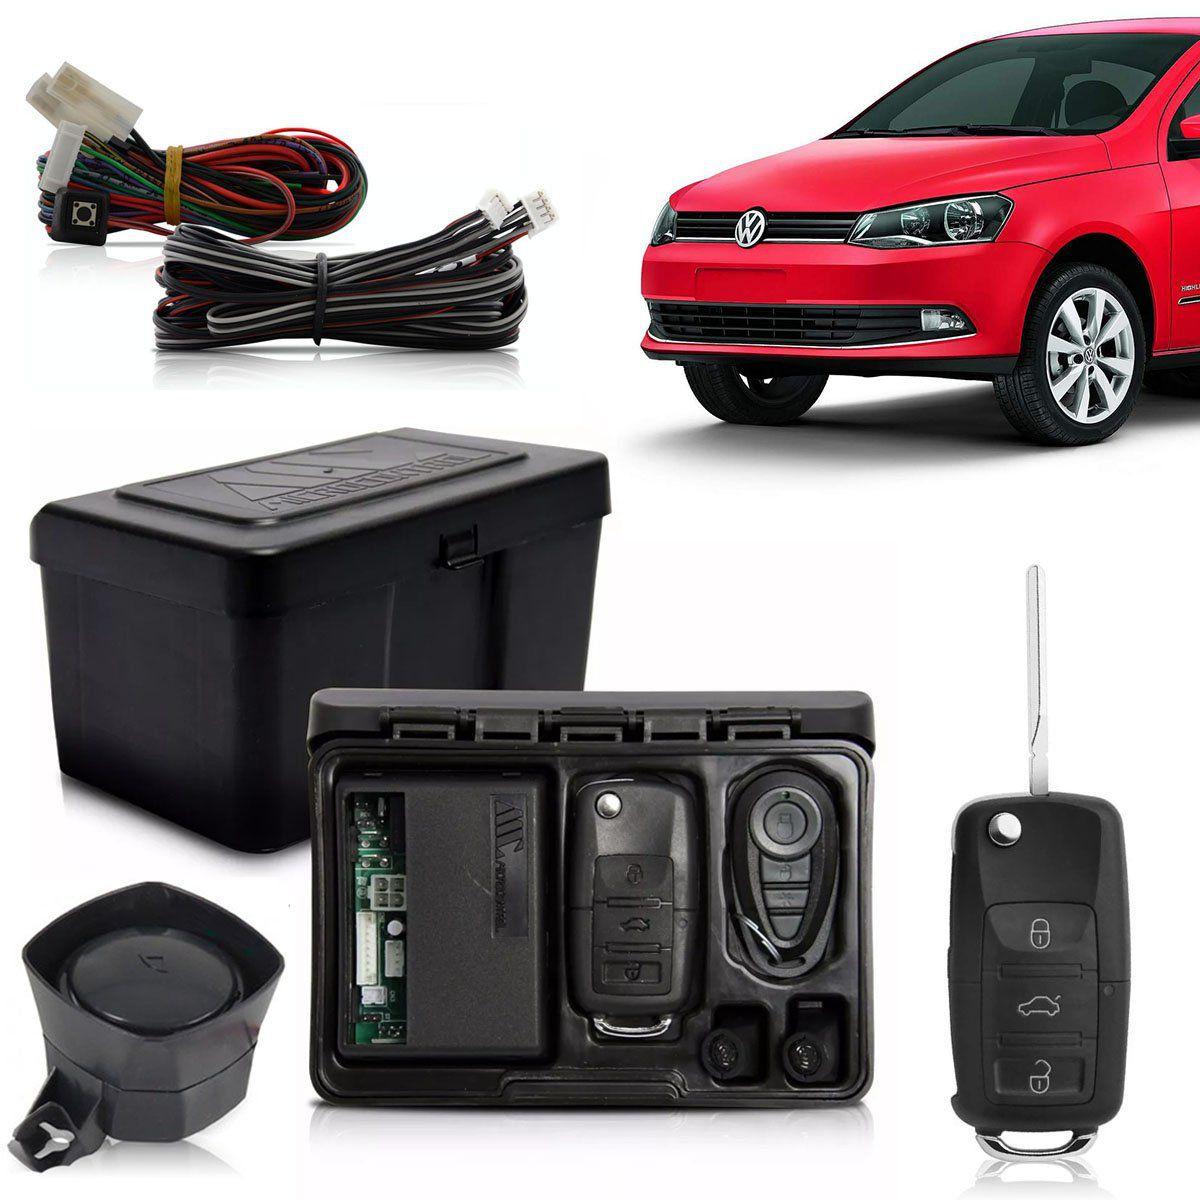 Alarme Automotivo Bloqueador Anti-furto Chave Canivete Gol G6 2012 Até 2016